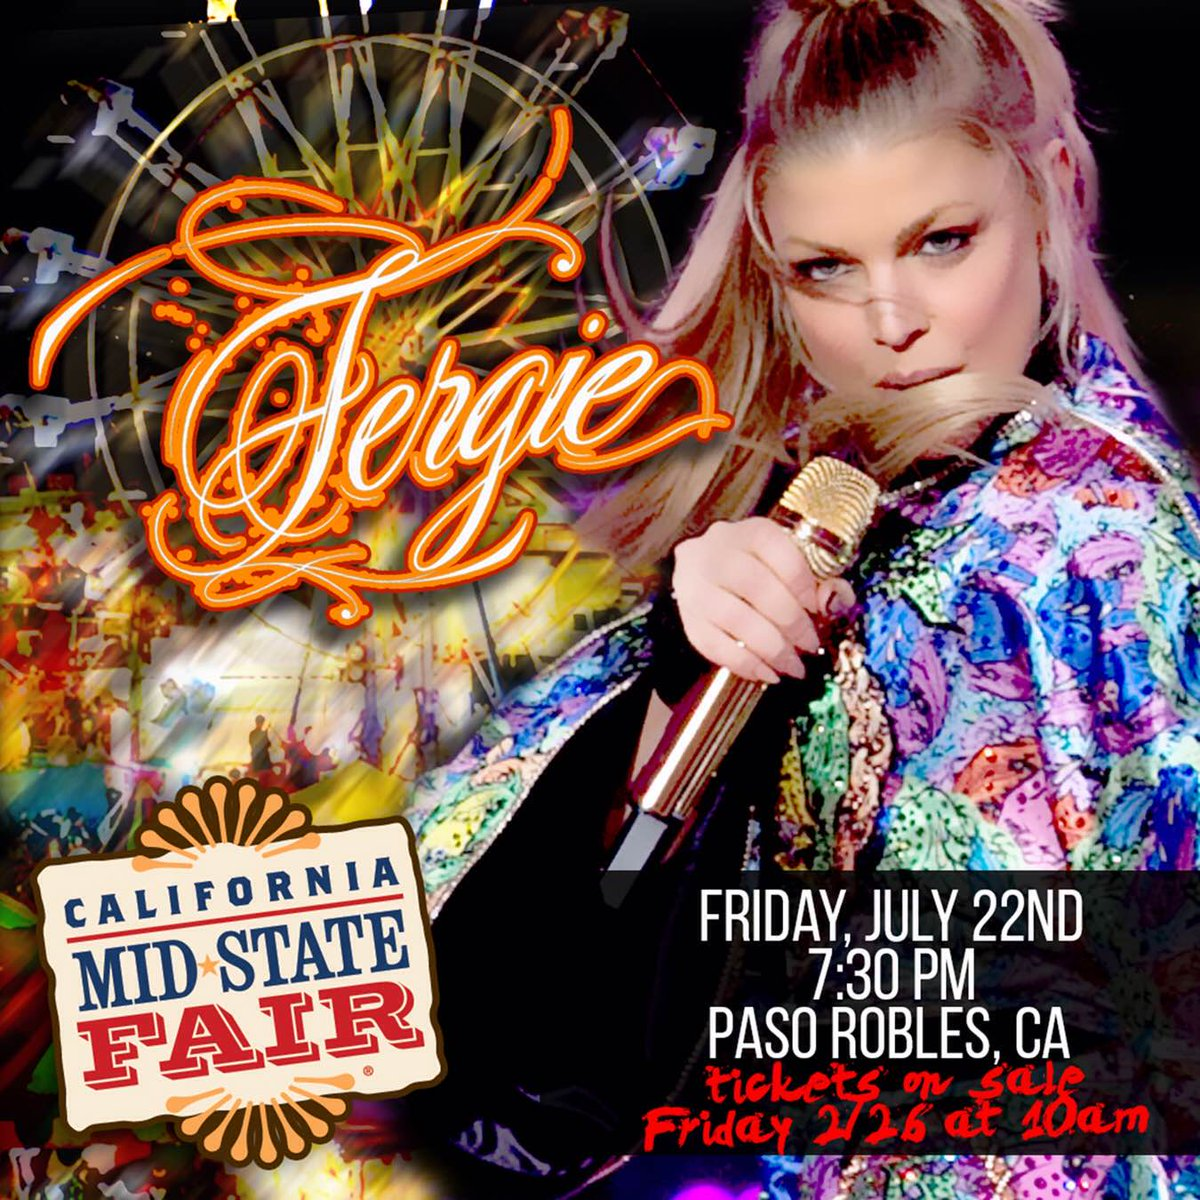 Tickets 4 the 7/22 @CaMidStateFair #Fergie show go #onsale TODAY 2/26 at 10am: https://t.co/mKkVMESbHr https://t.co/rDFw6KmJRO